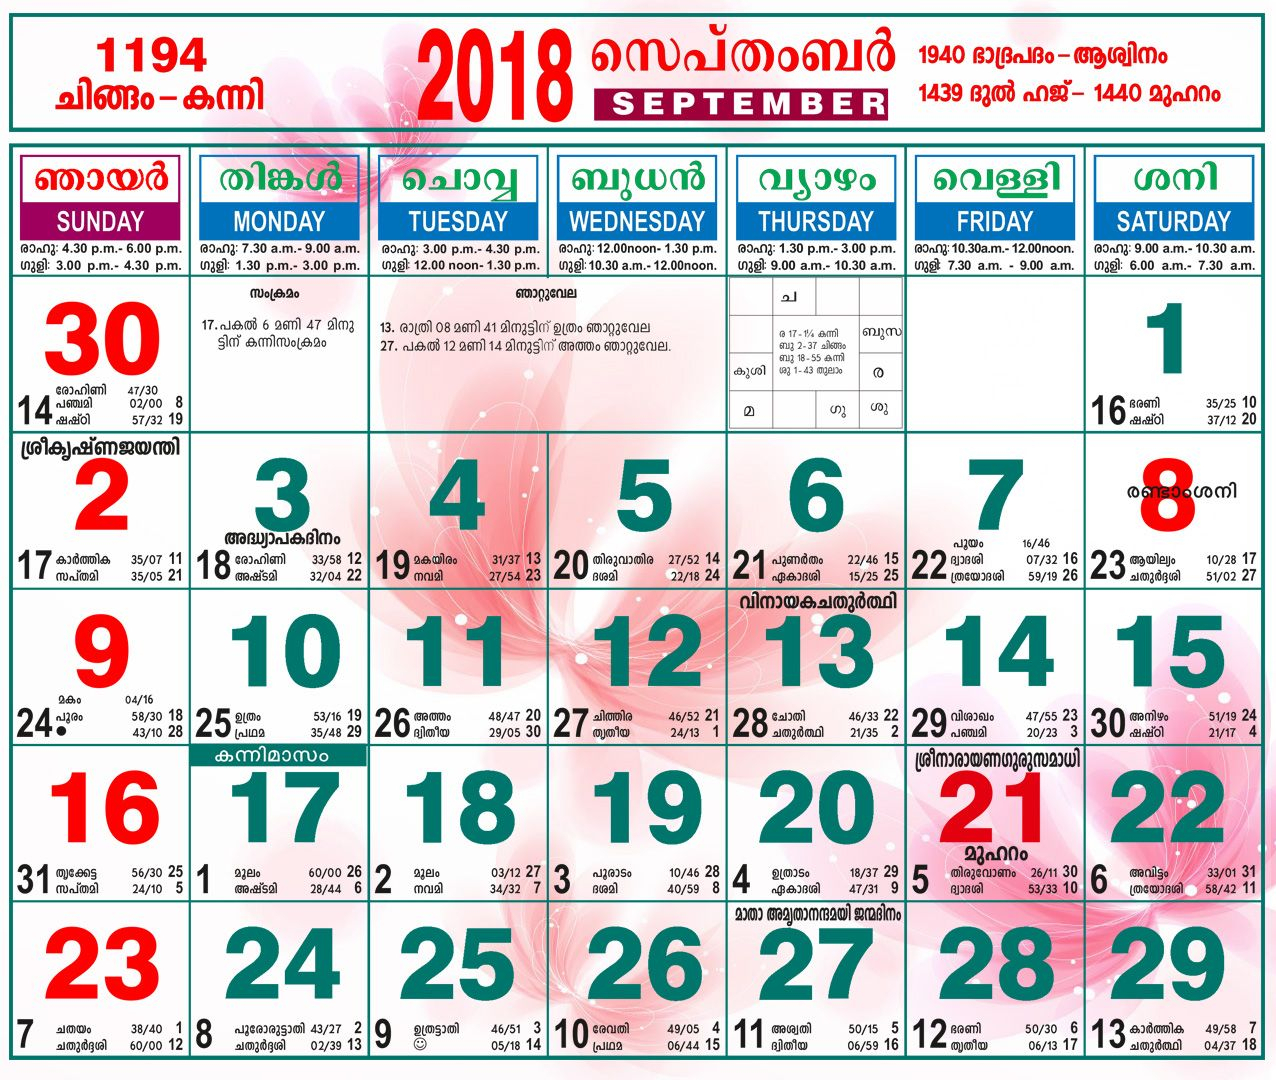 Malayalam Calendar September 2018 | Malayalam Calendar pertaining to Malayalam Calendar 2018 September